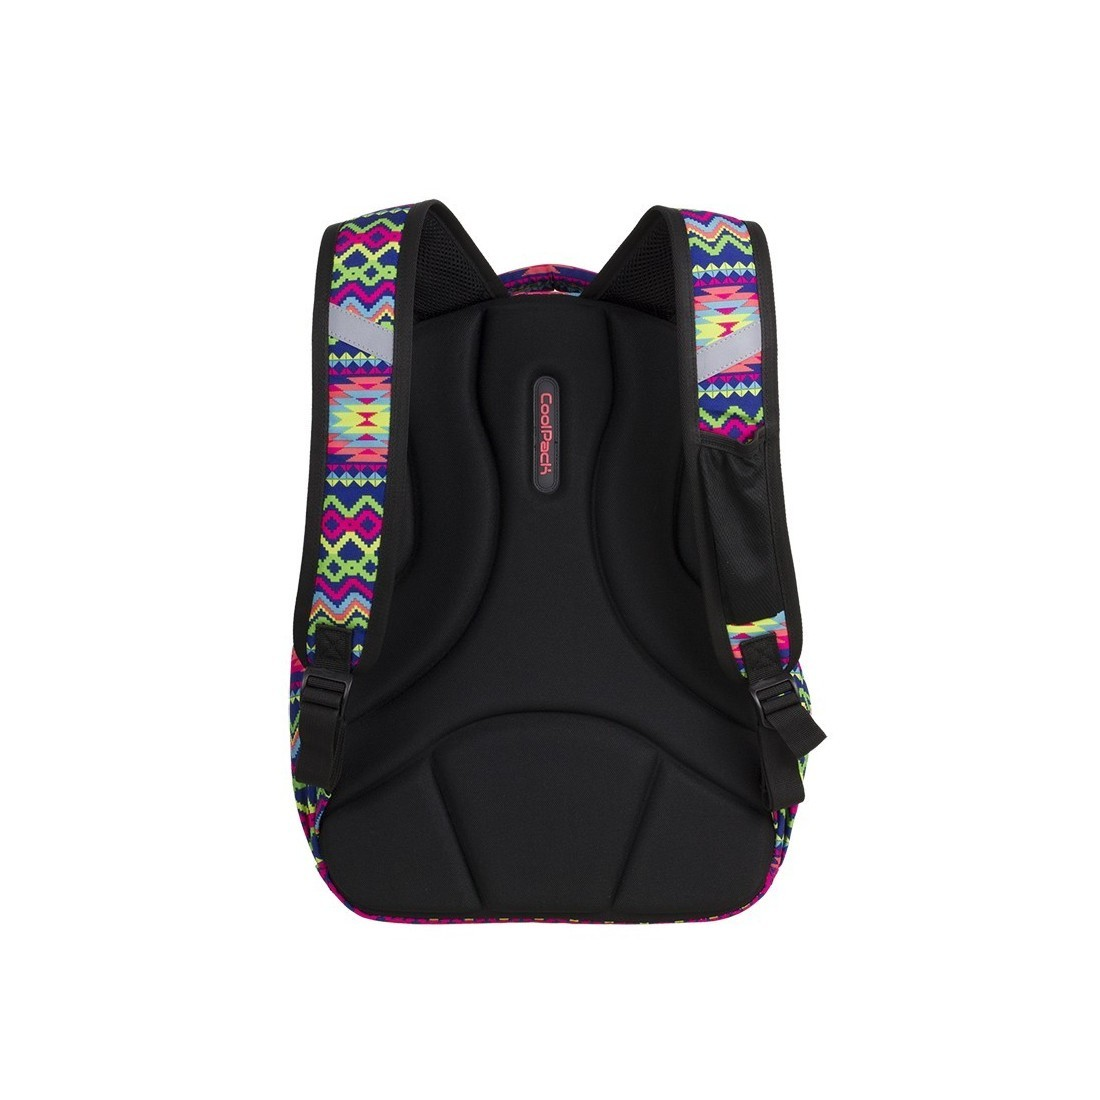 124f630f0e598 ... Plecak szkolny CoolPack CP STRIKE BOHO ELECTRA kolorowe zygzaki  profilowane plecy - 781+ GRATIS POMPON